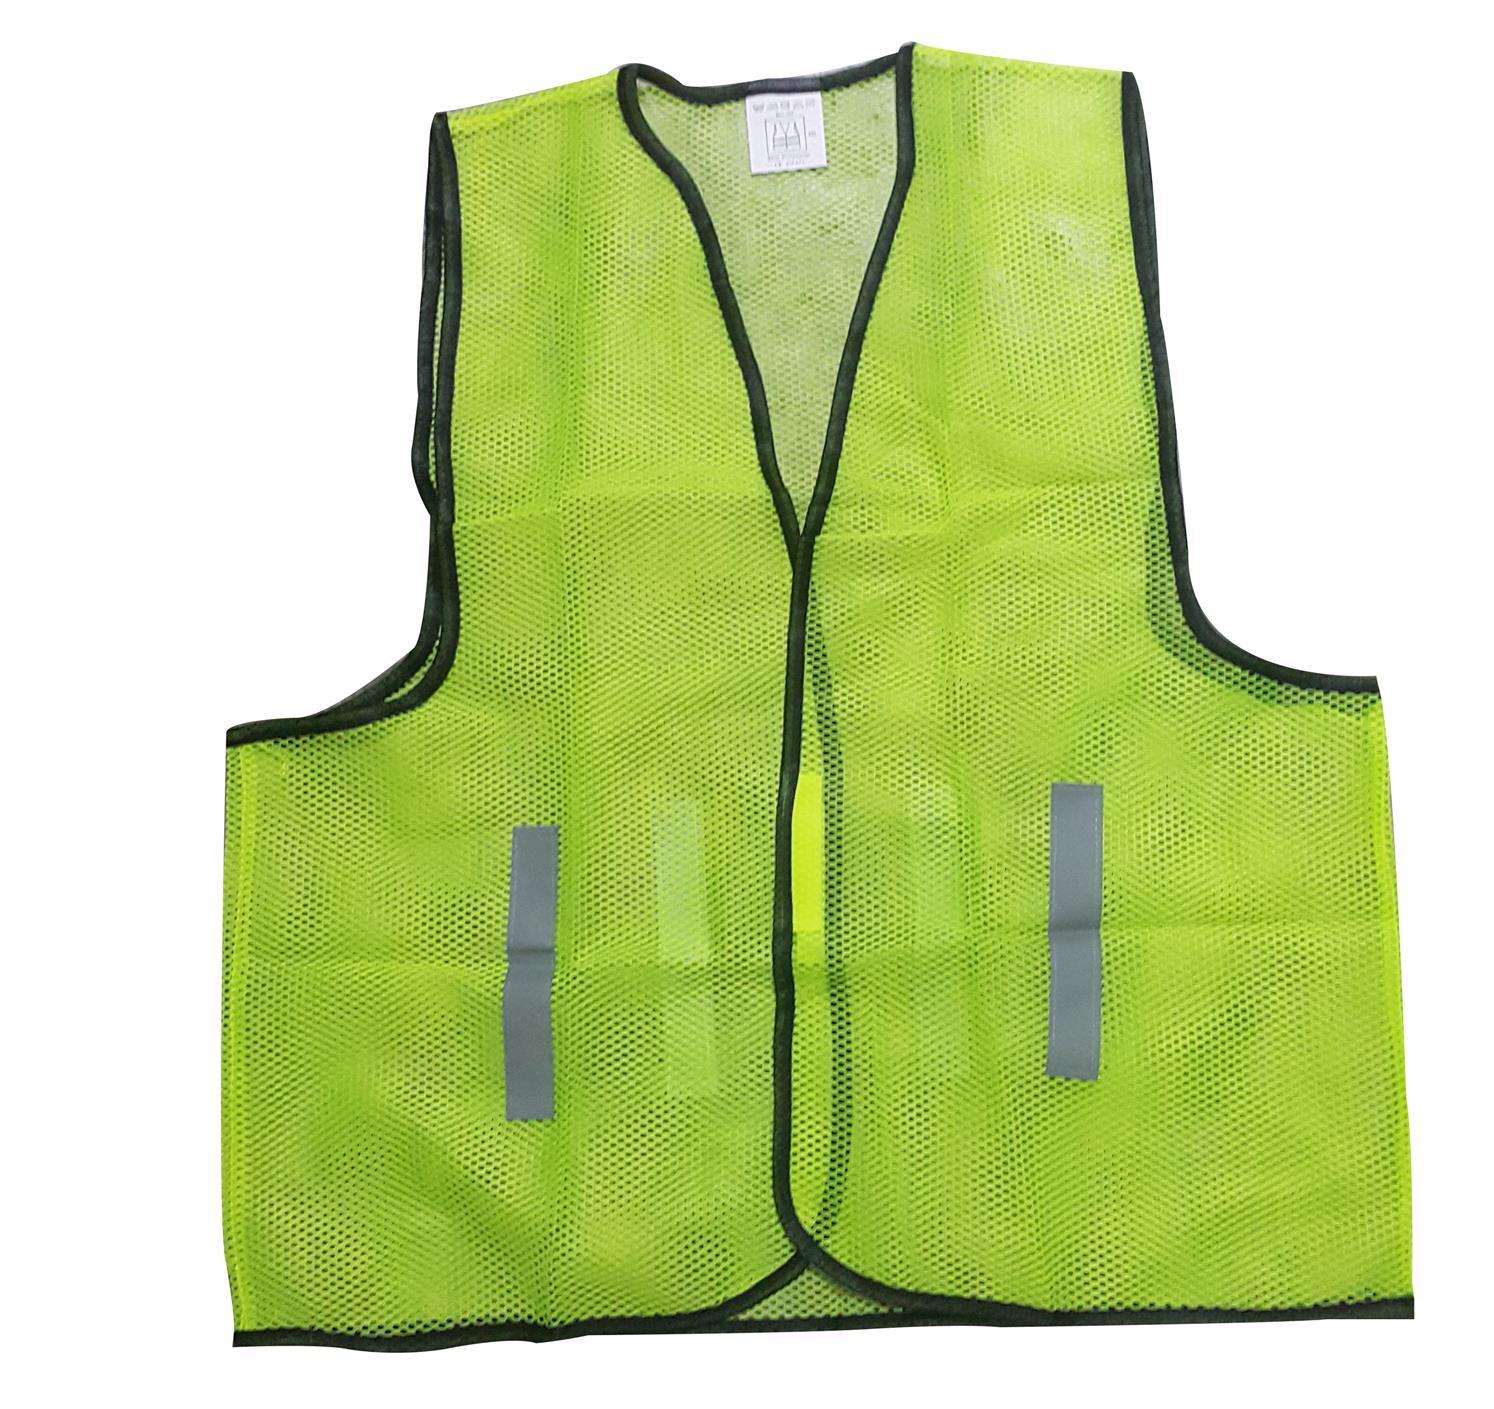 Reflective Safety Vest Net Orange Or Green